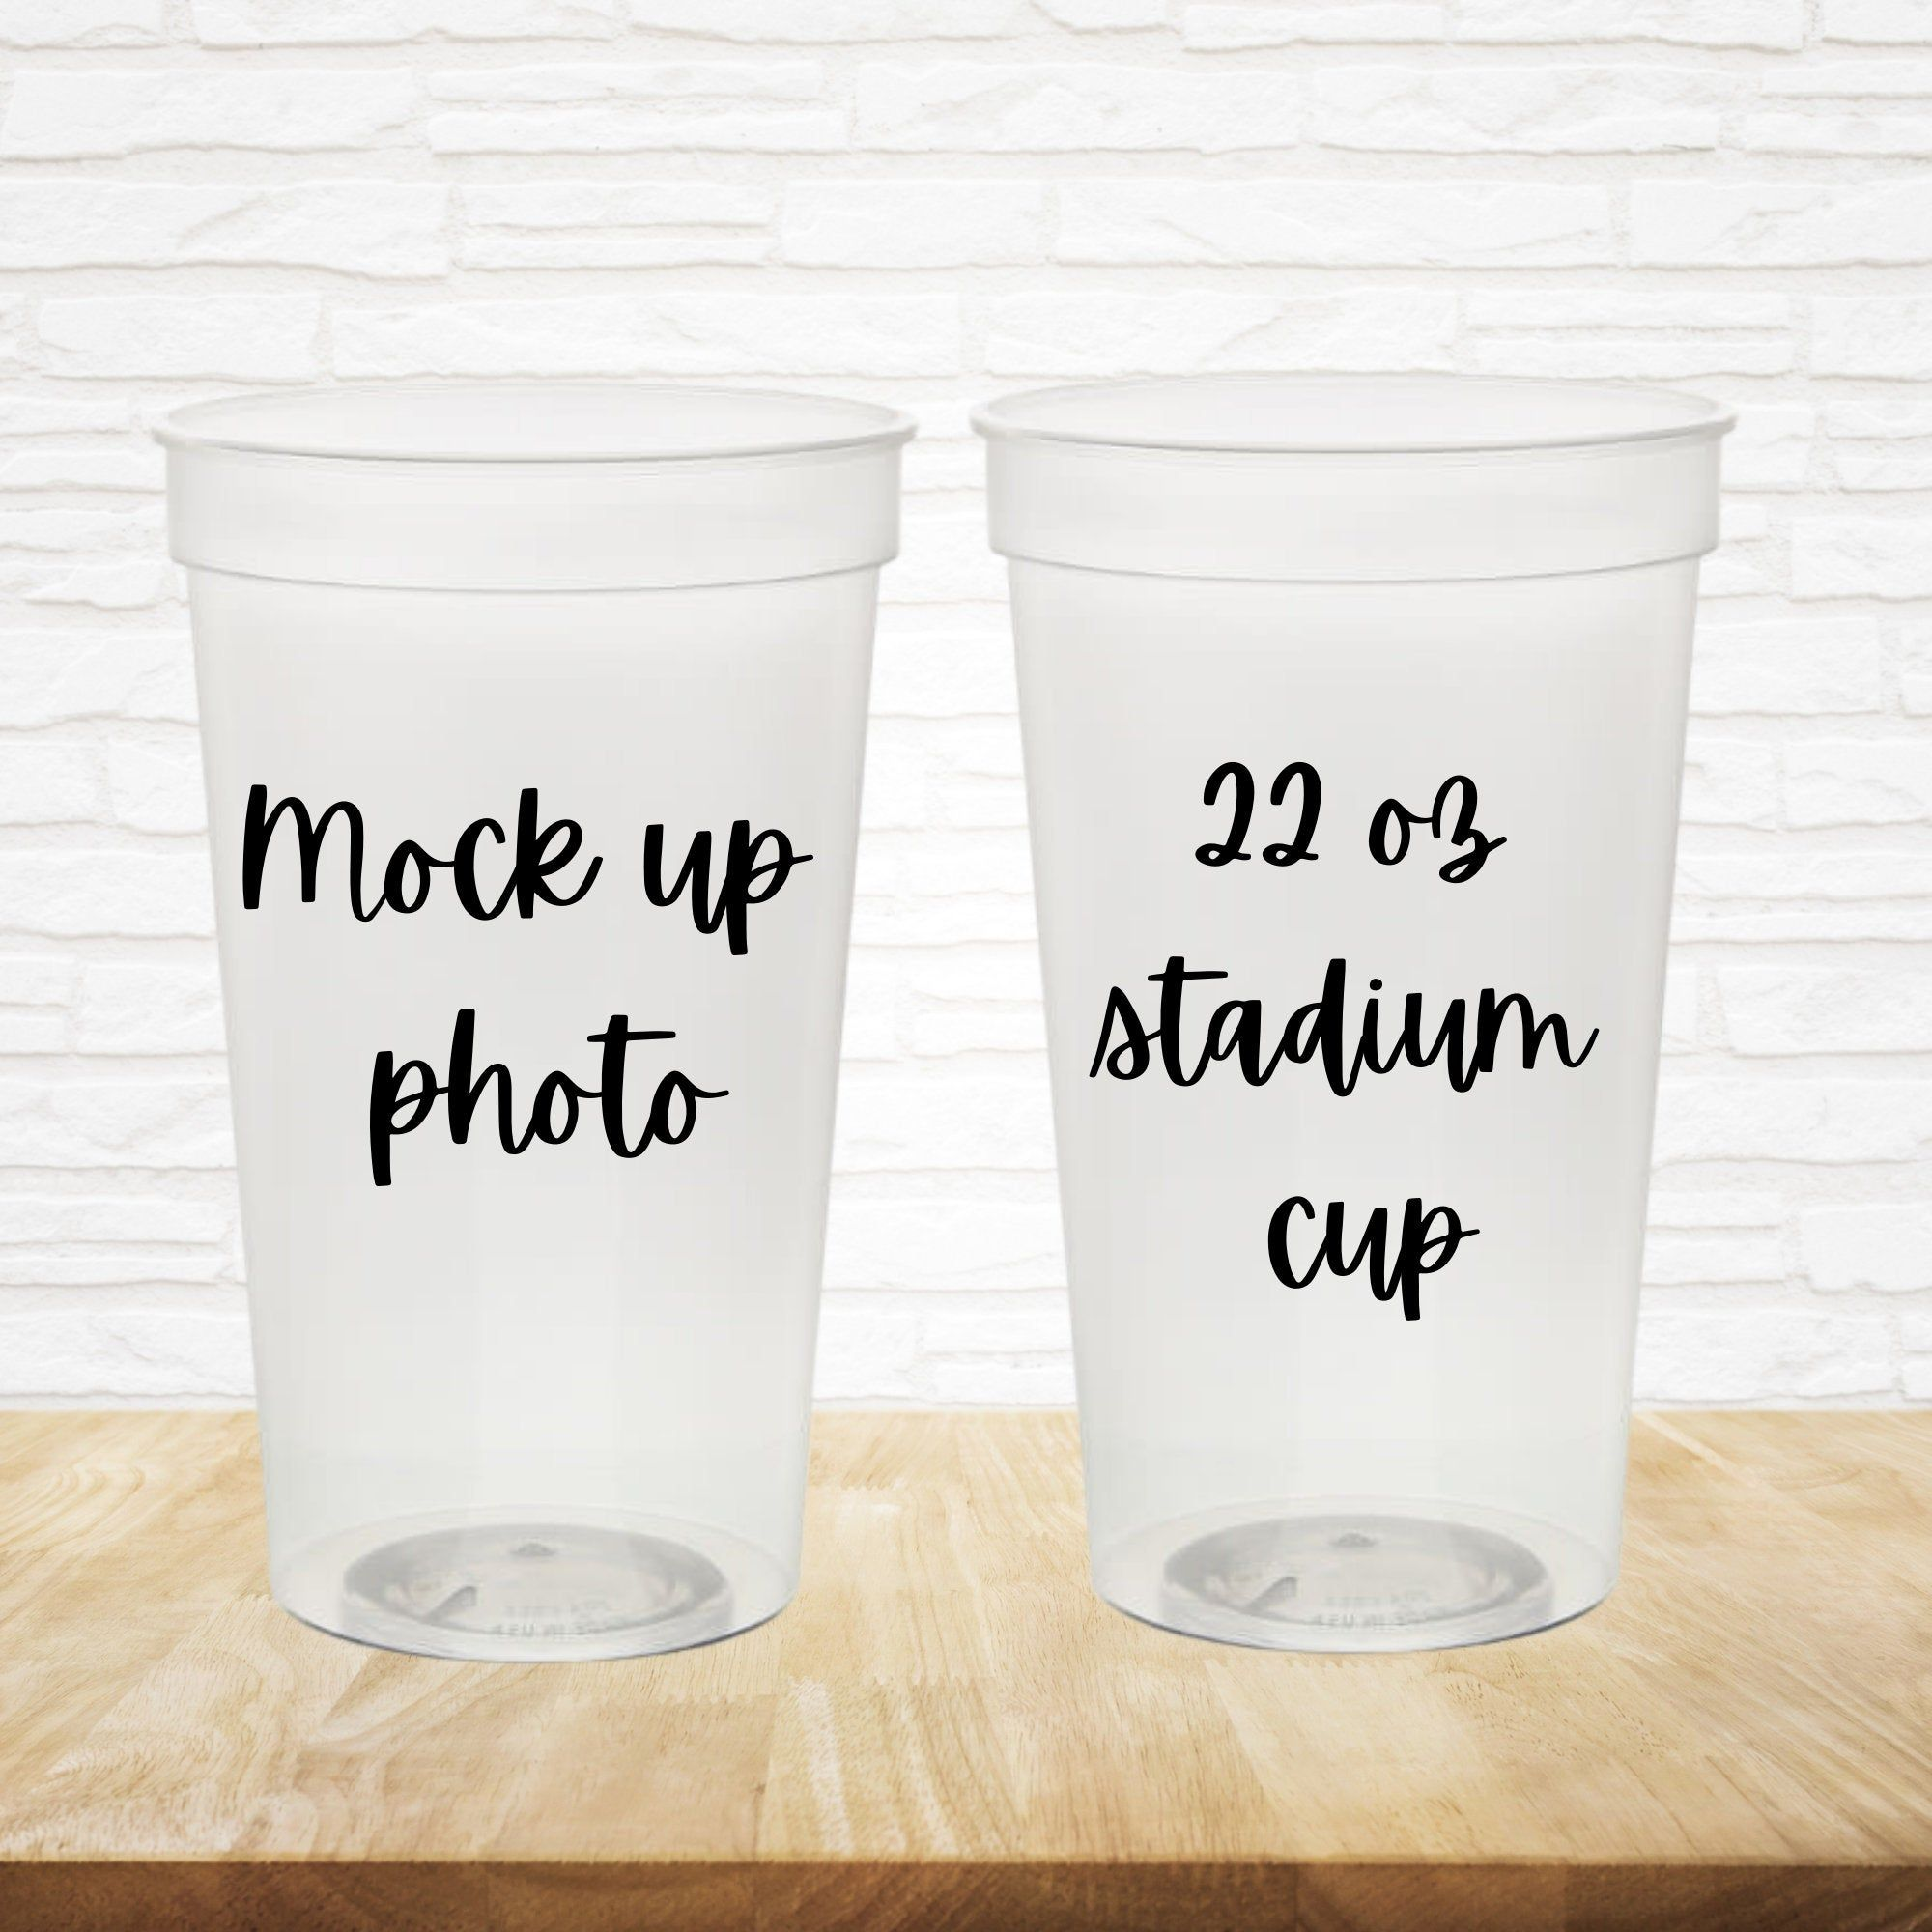 Bundle Transparent Stadium Cup Mock Up Photo 22 Oz Stadium Etsy In 2021 Photo Cup Stadium Cups Reusable Coffee Sleeve